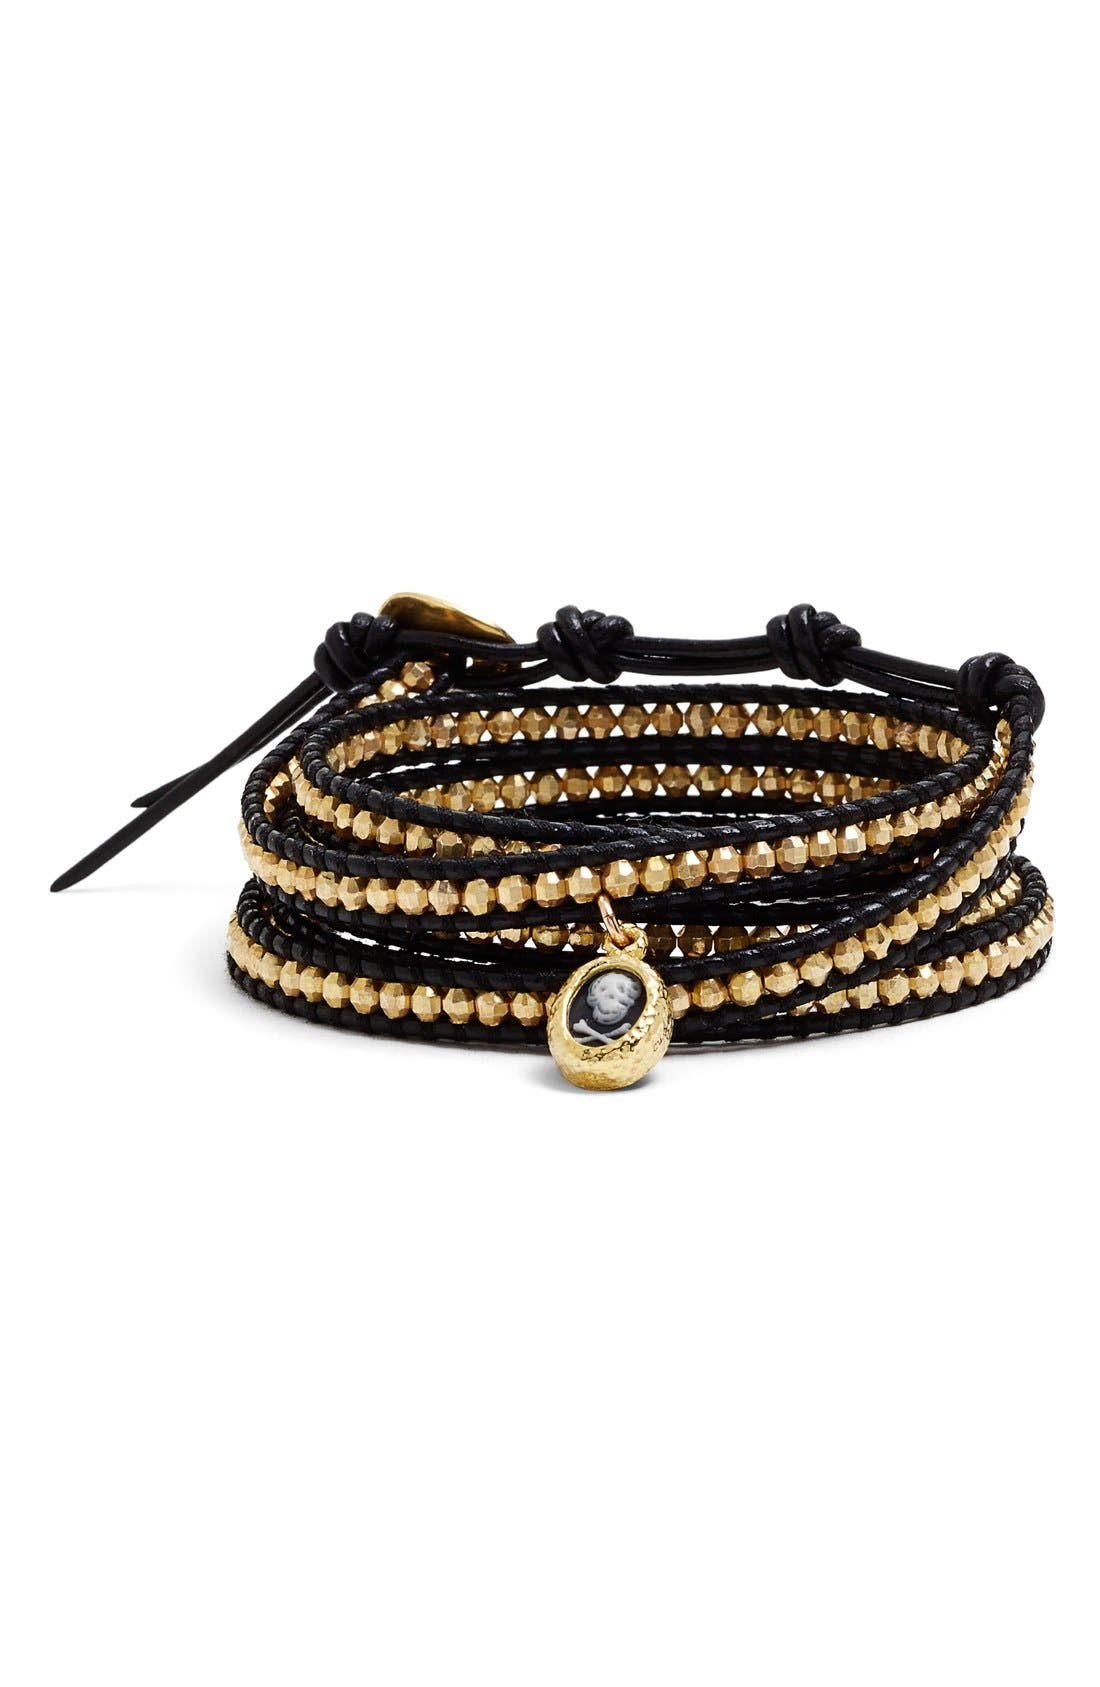 Alternate Image 1 Selected - Chan Luu Skull Charm Beaded Leather Wrap Bracelet